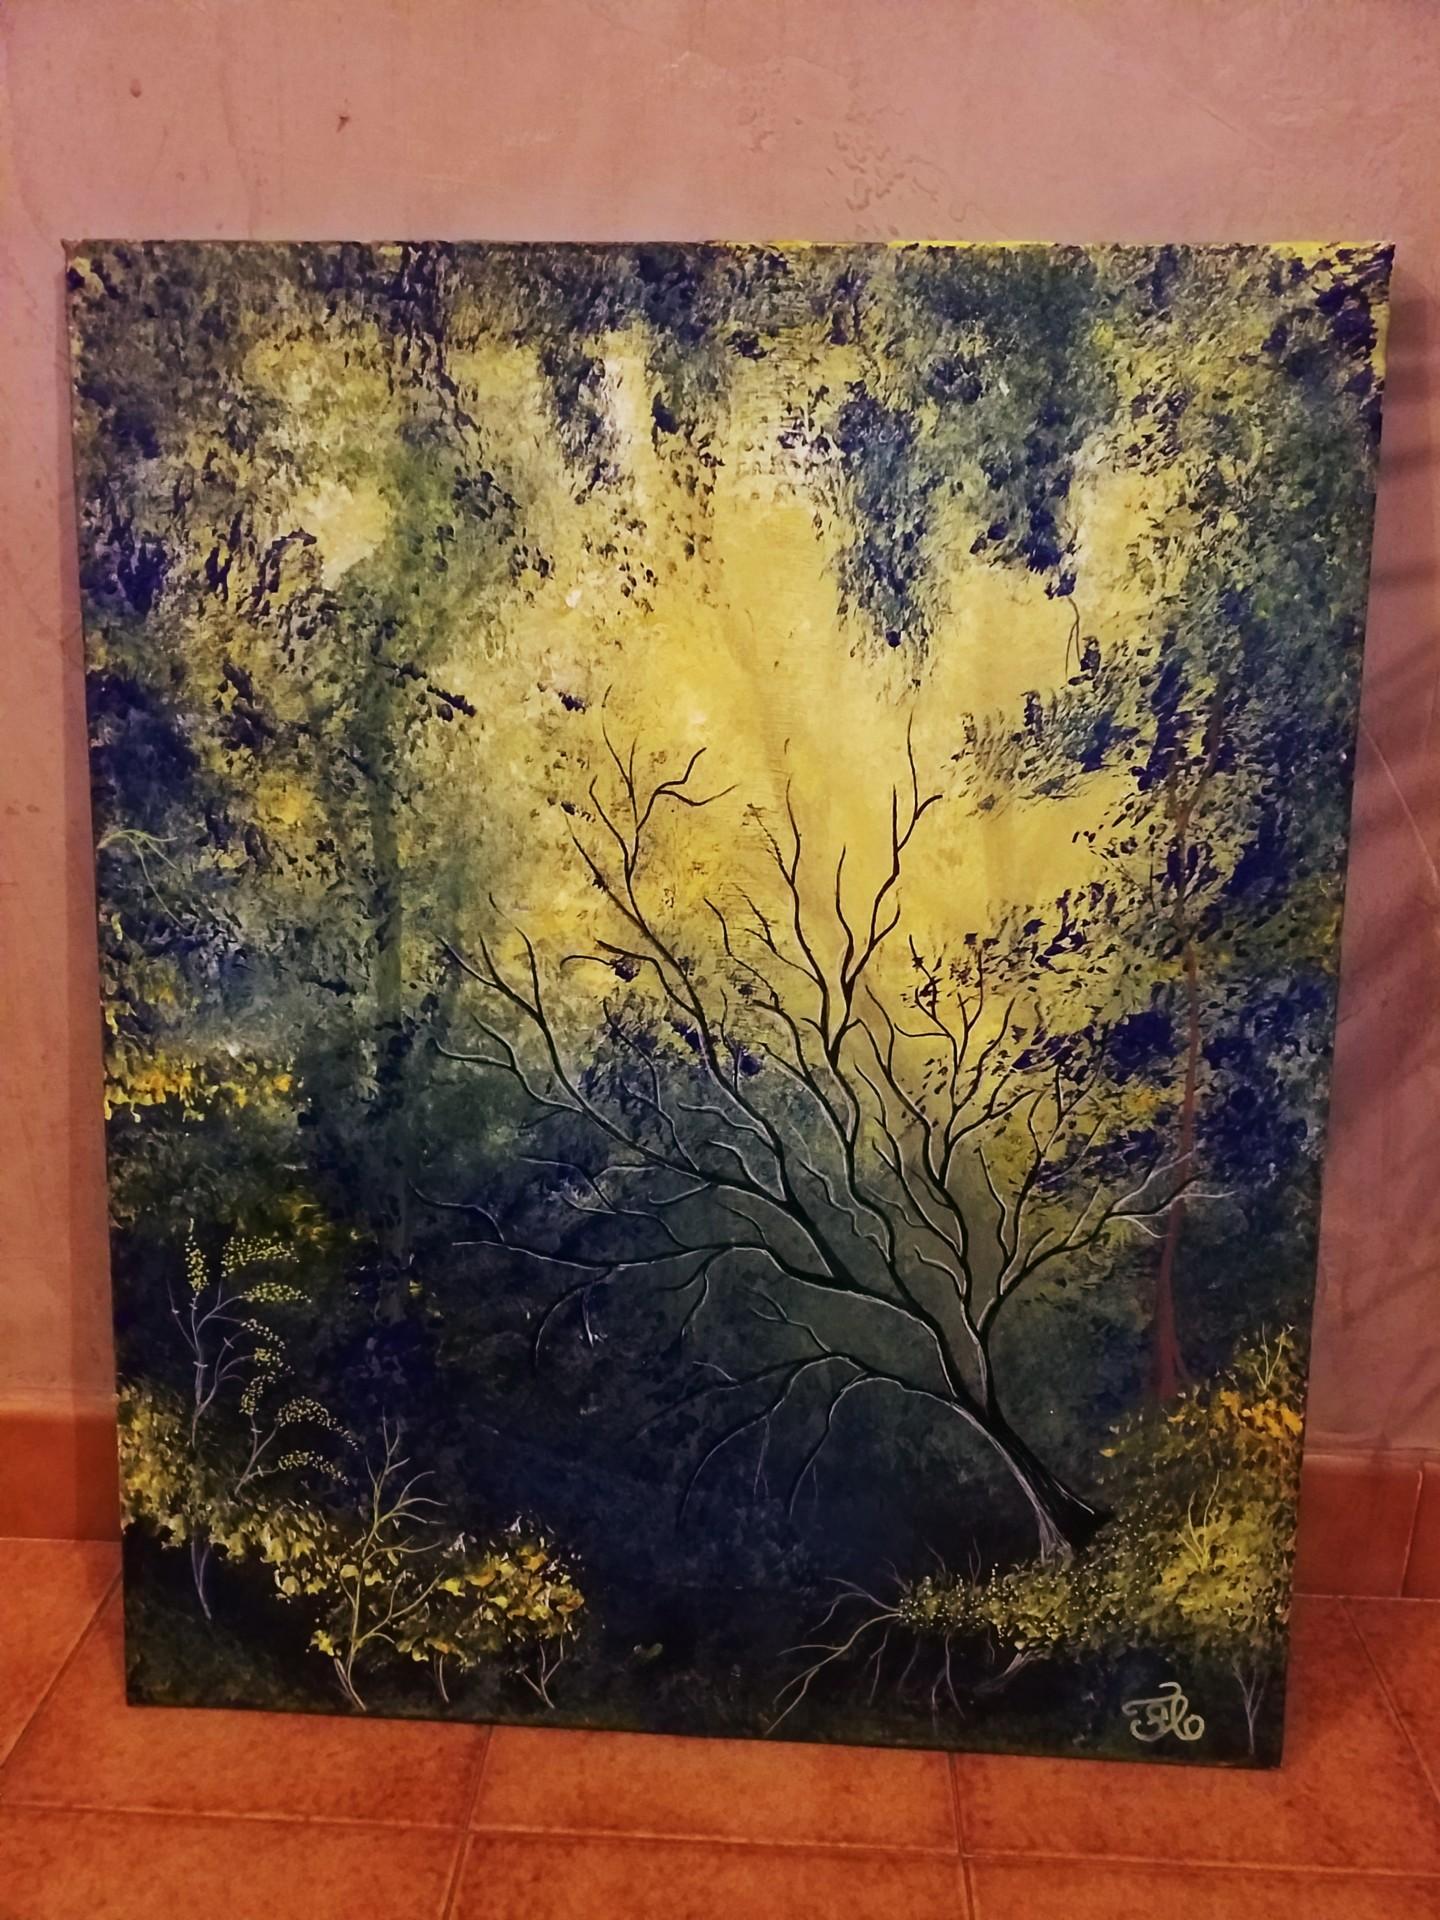 Florence Castelli  flofloyd - La forêt en 2020